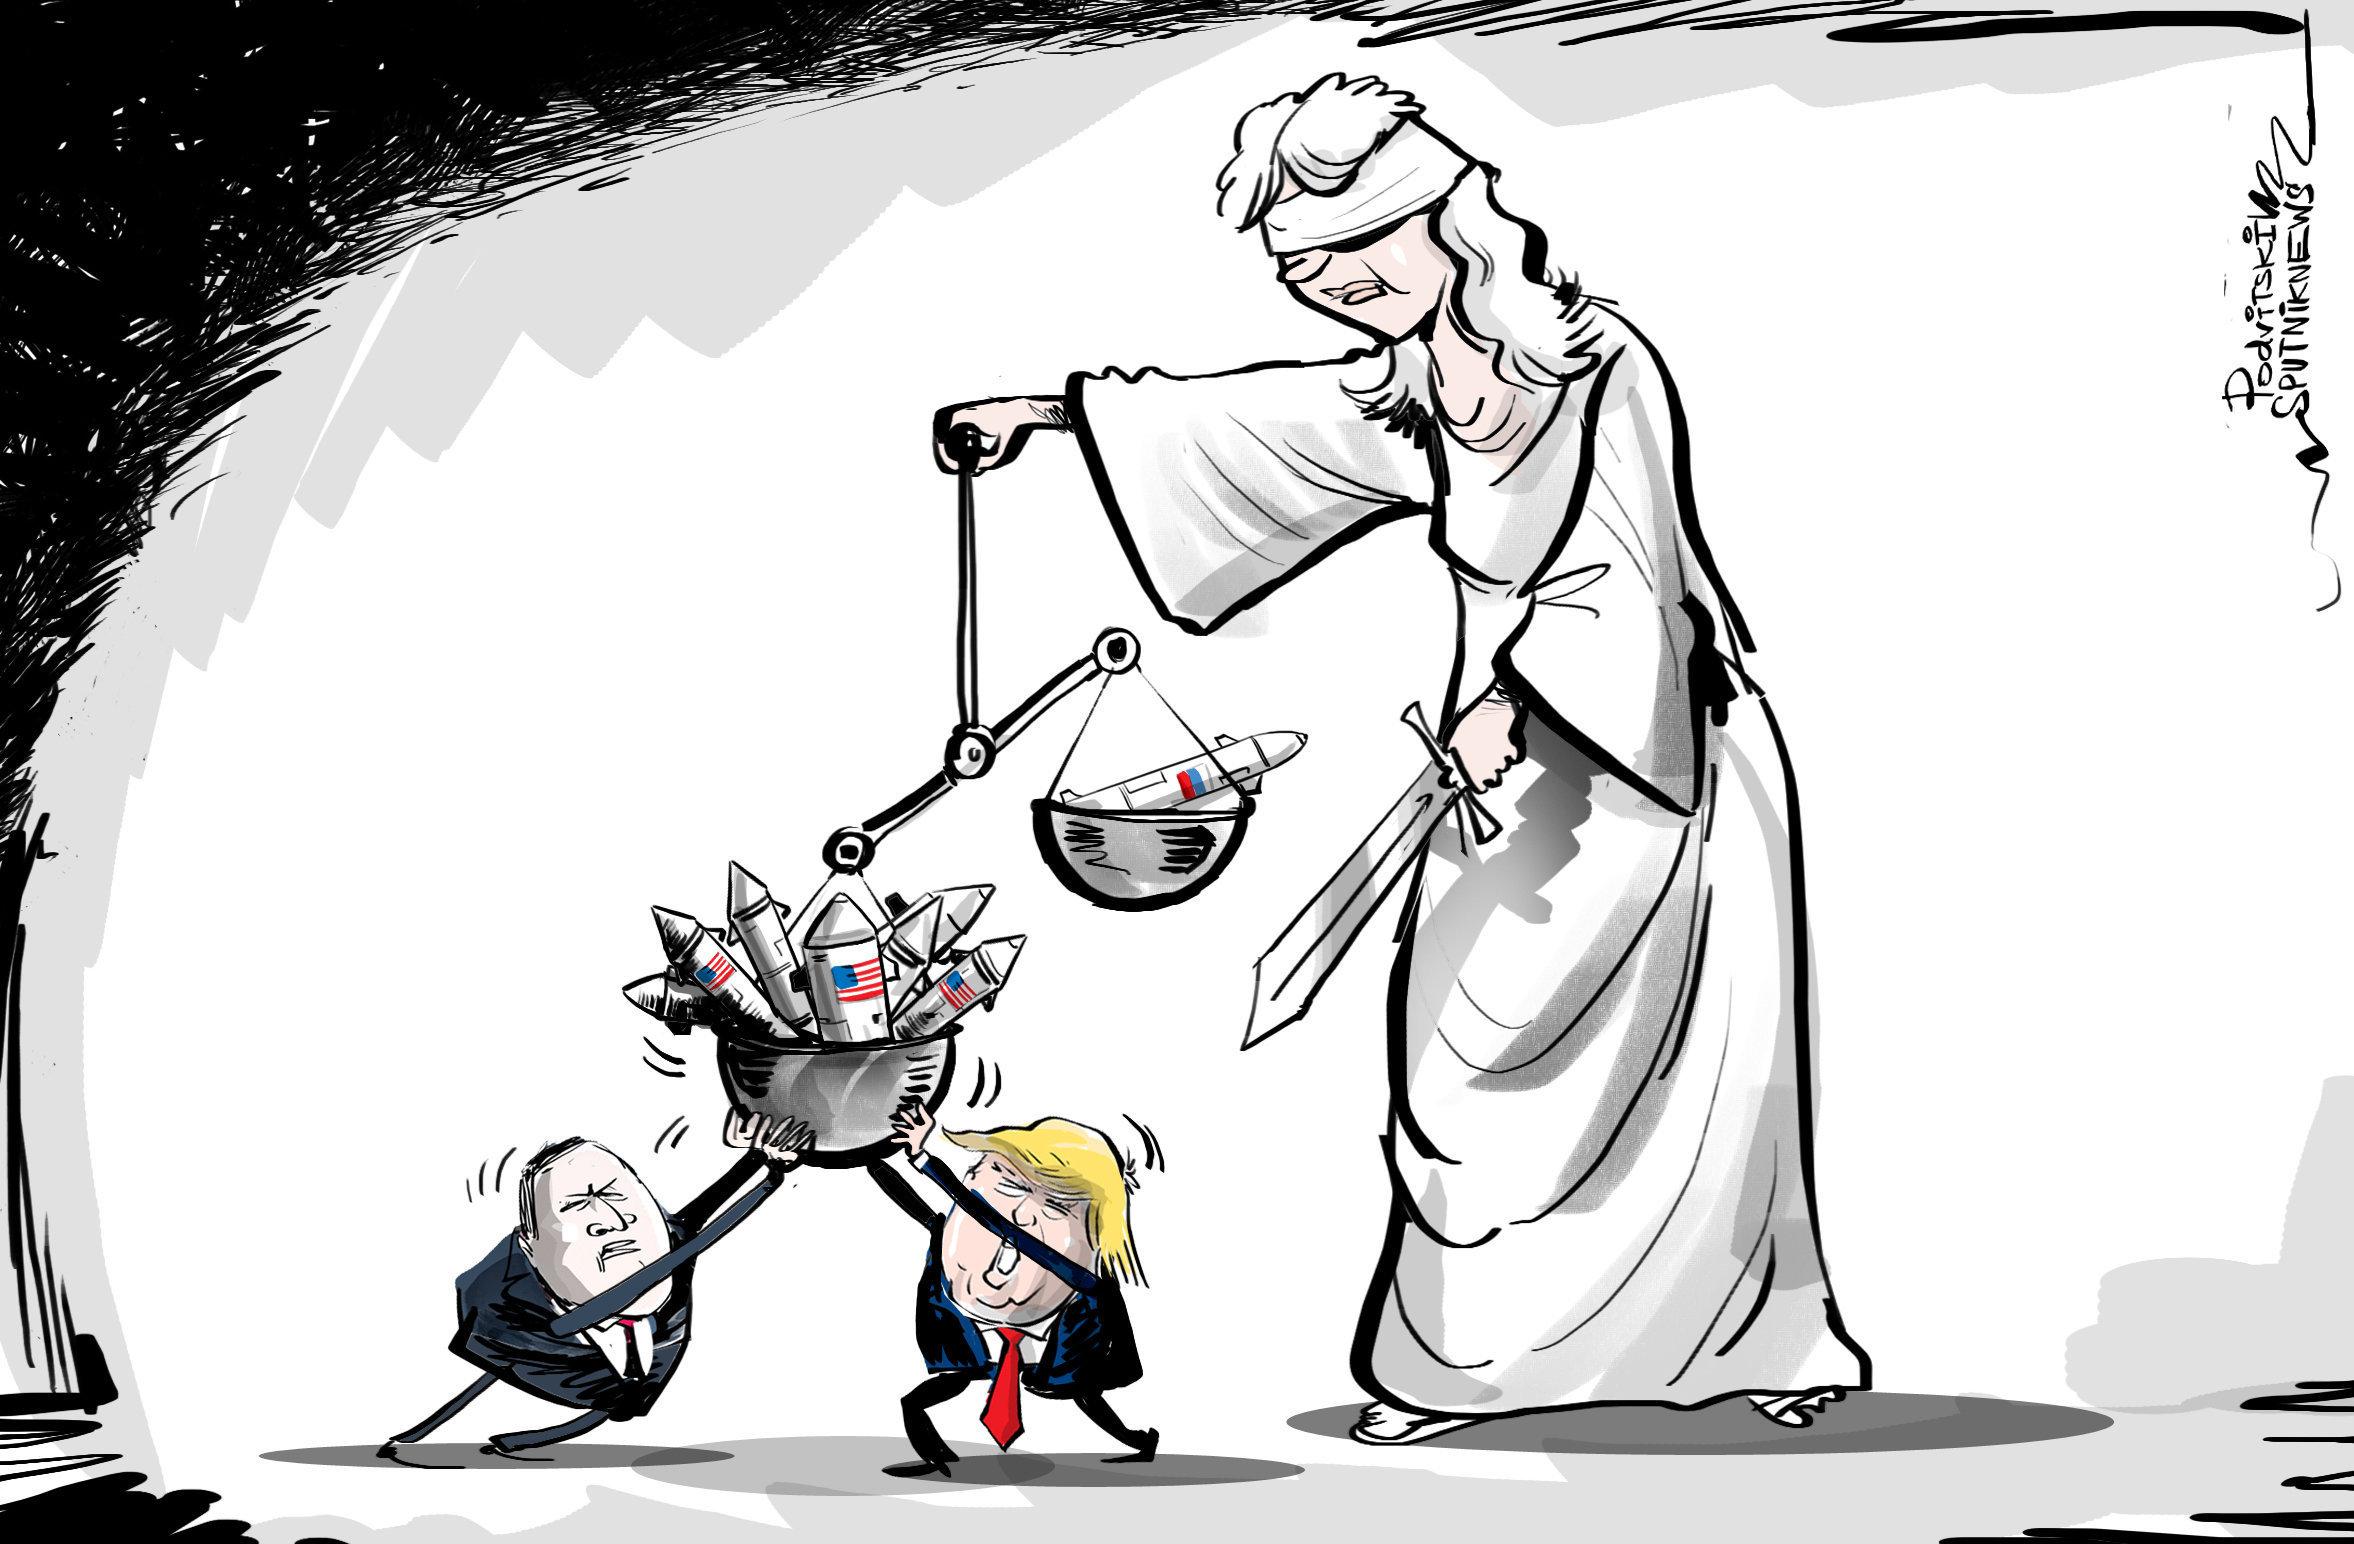 EEUU vs.  Rusia,  quién gana en la disputa sobre el Tratado INF